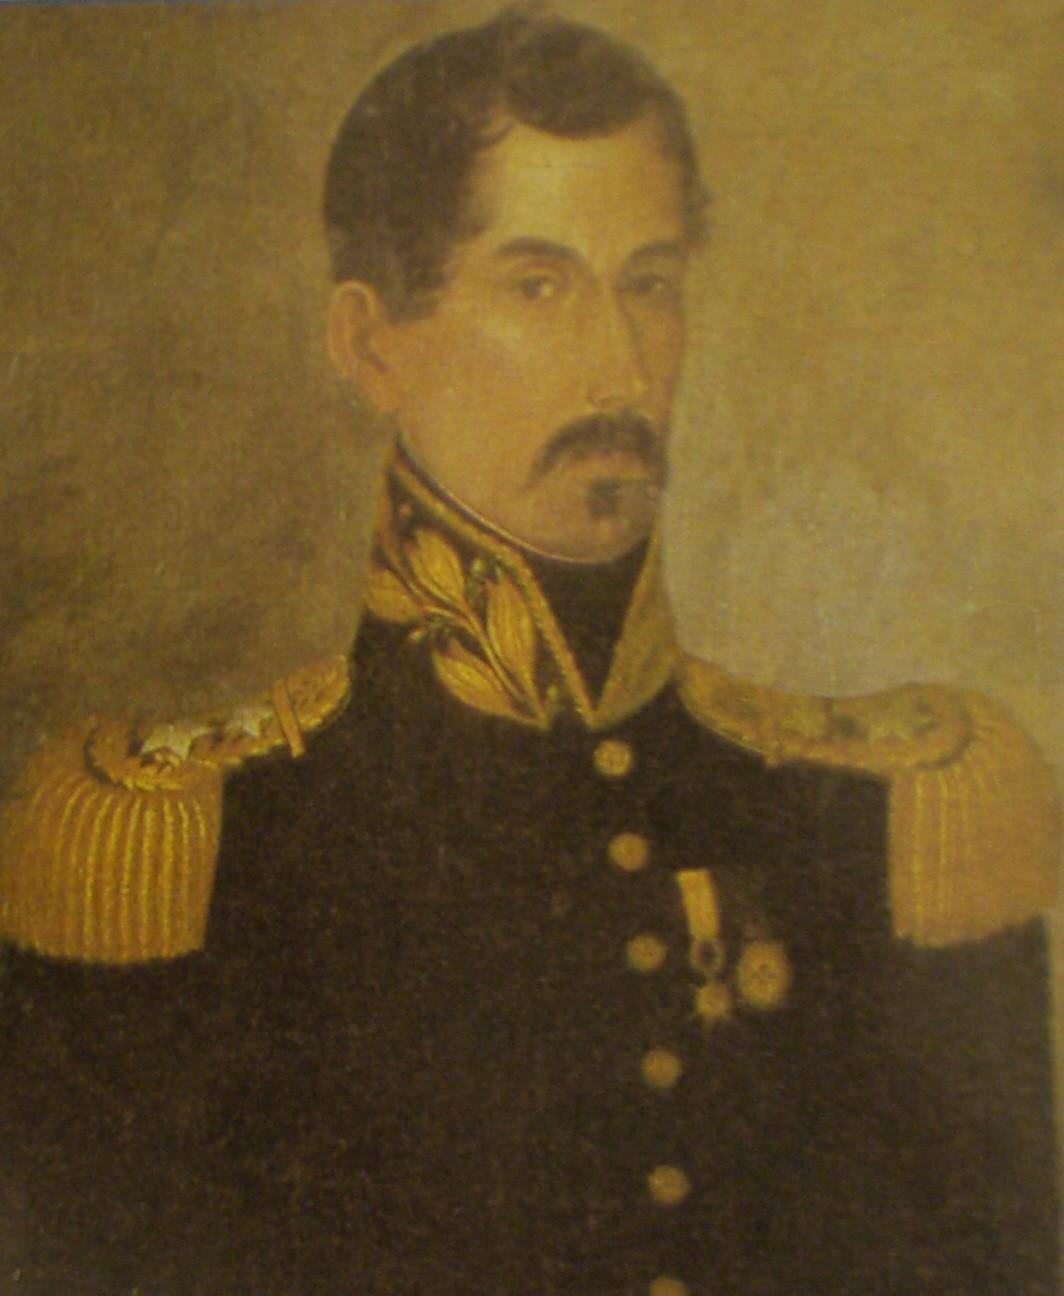 jose antonio paez 1839 1843: